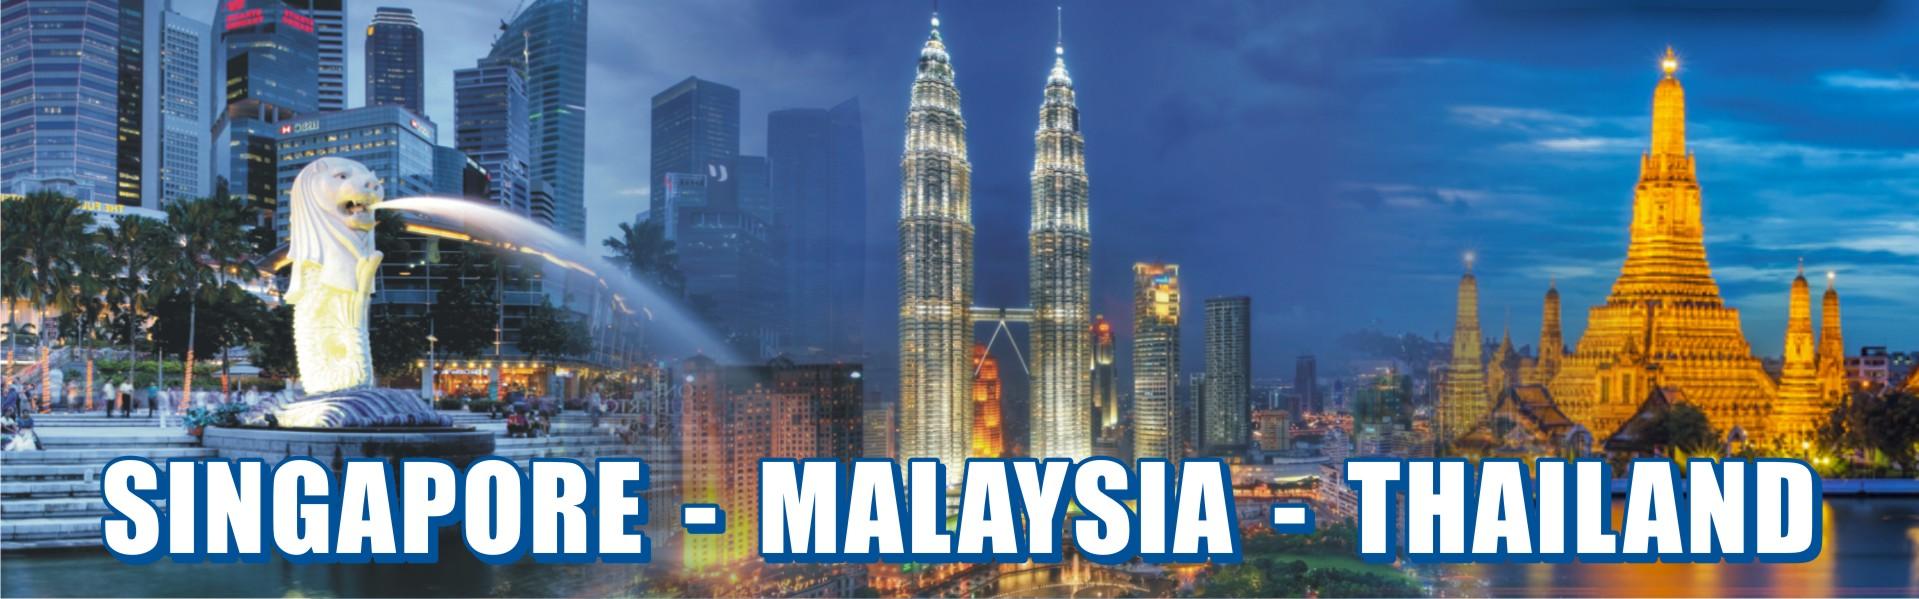 Singapore Malaysia & Thailand Combo